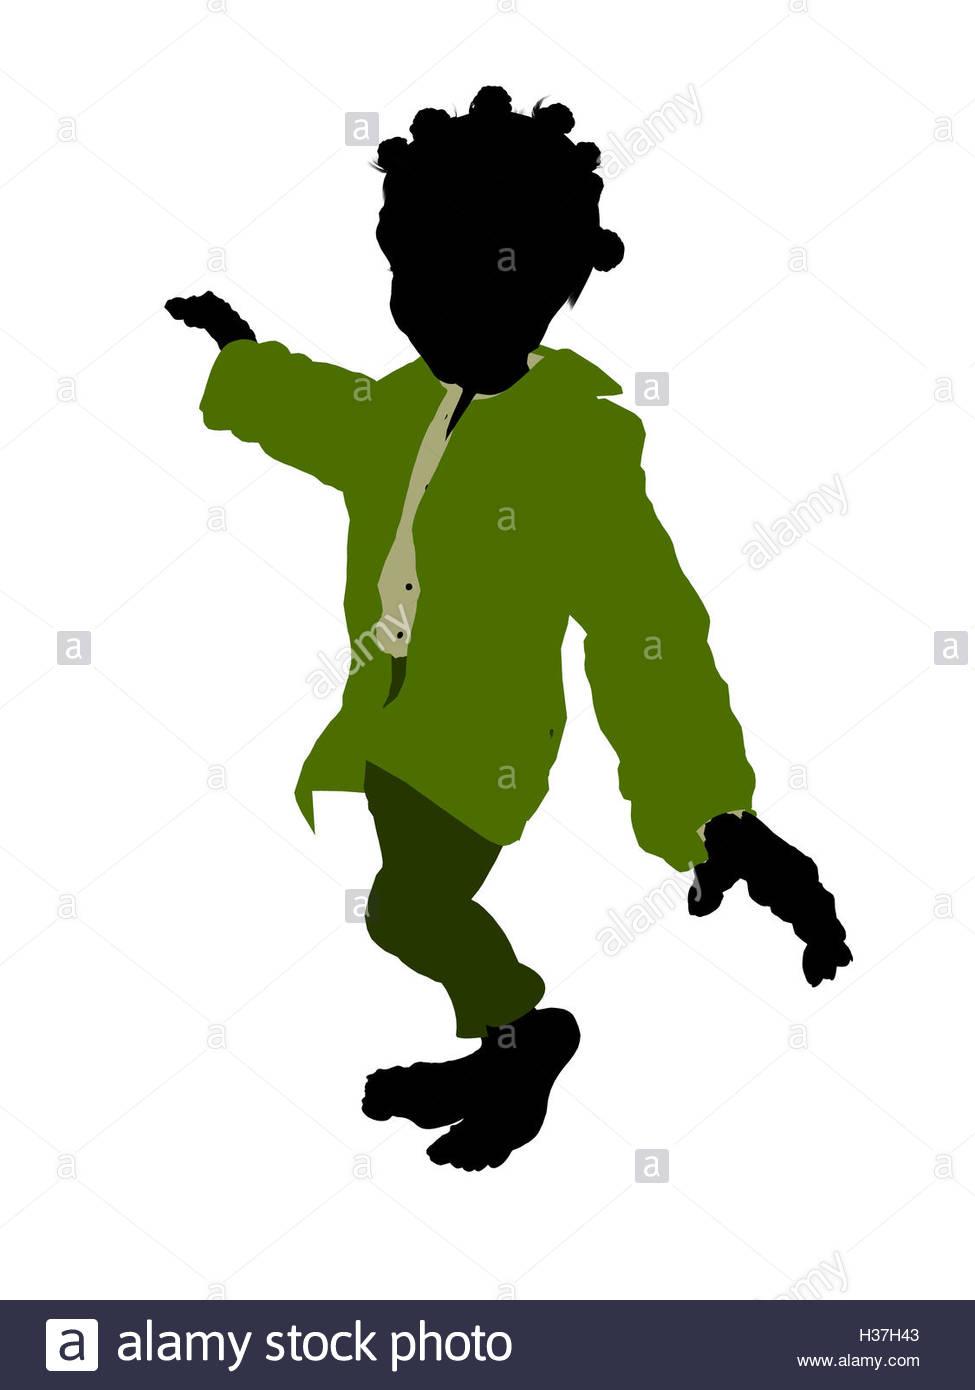 975x1390 Dwarf Silhouette Illustration Stock Photo 122483651